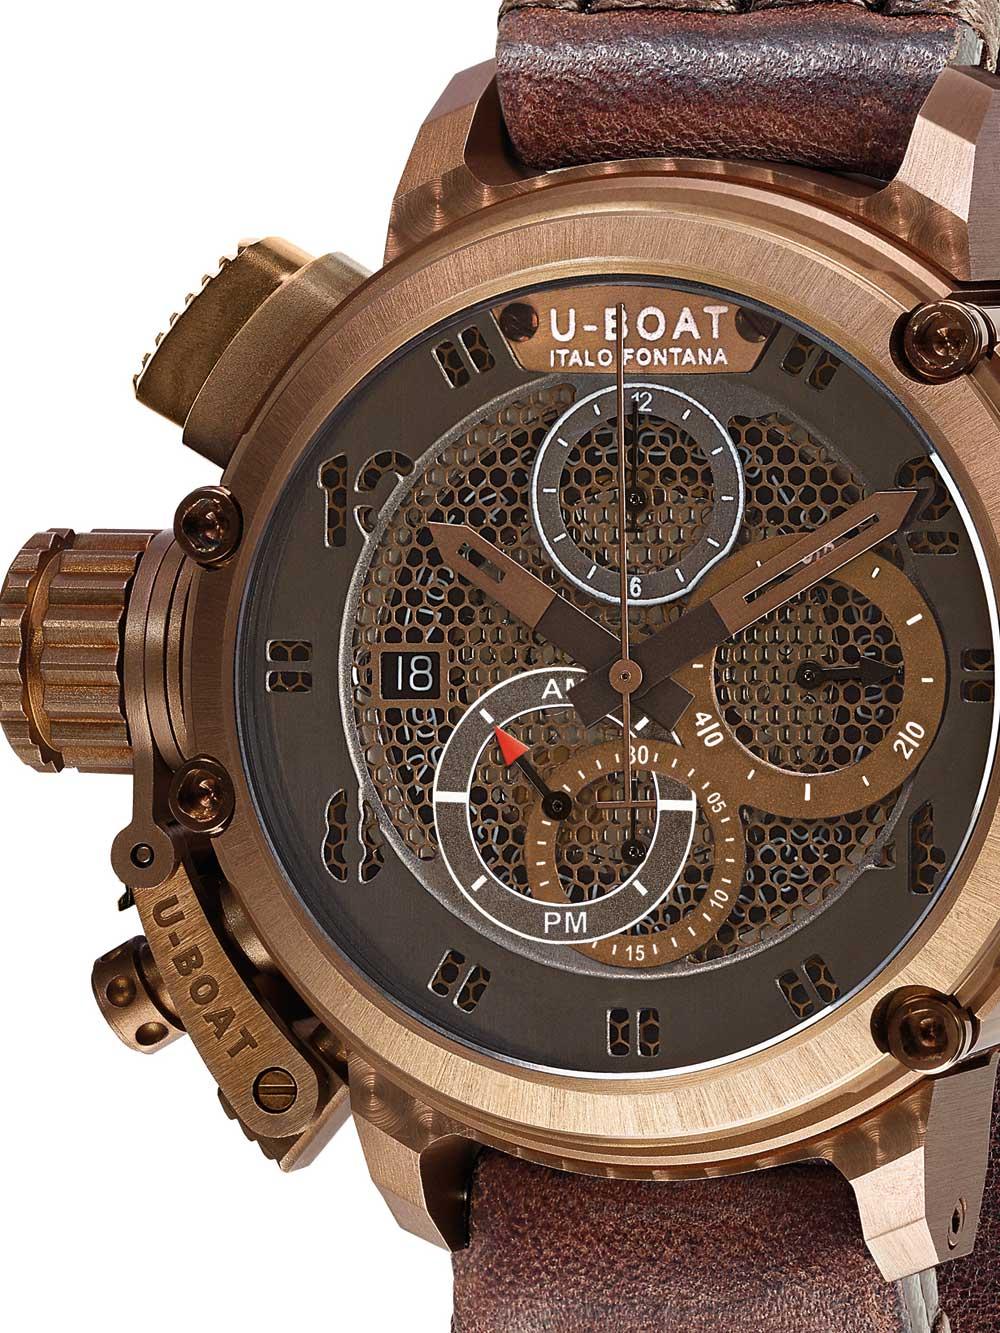 8096 Chimera Bronze Autom. Chrono 46 mm